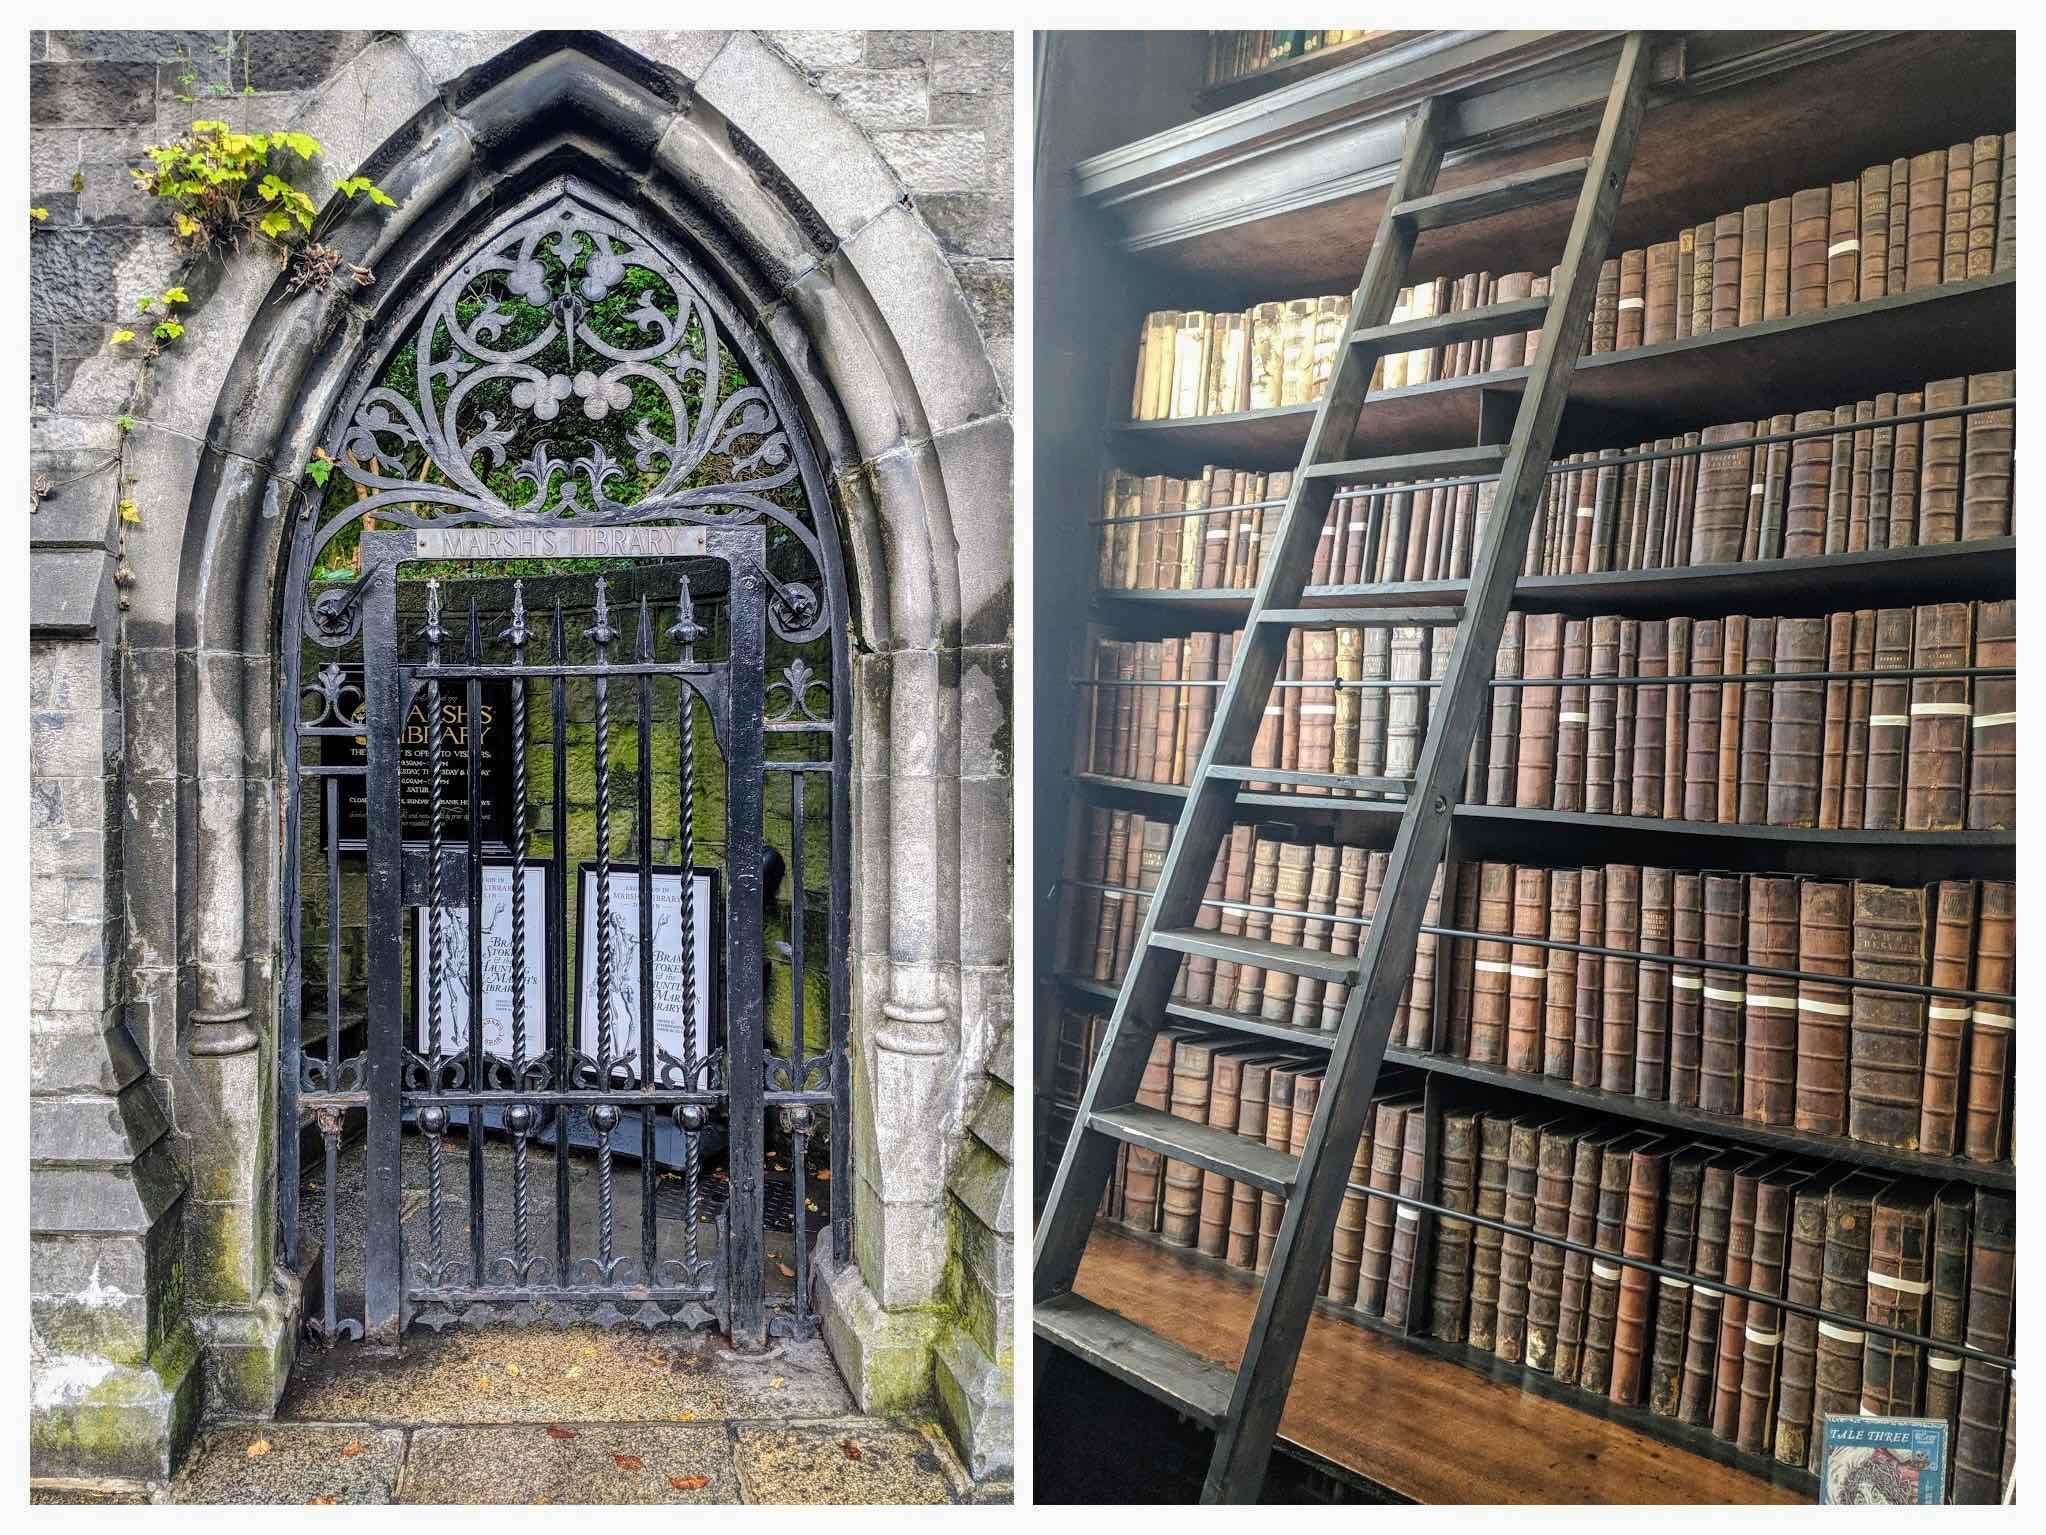 Marsh library Dublin